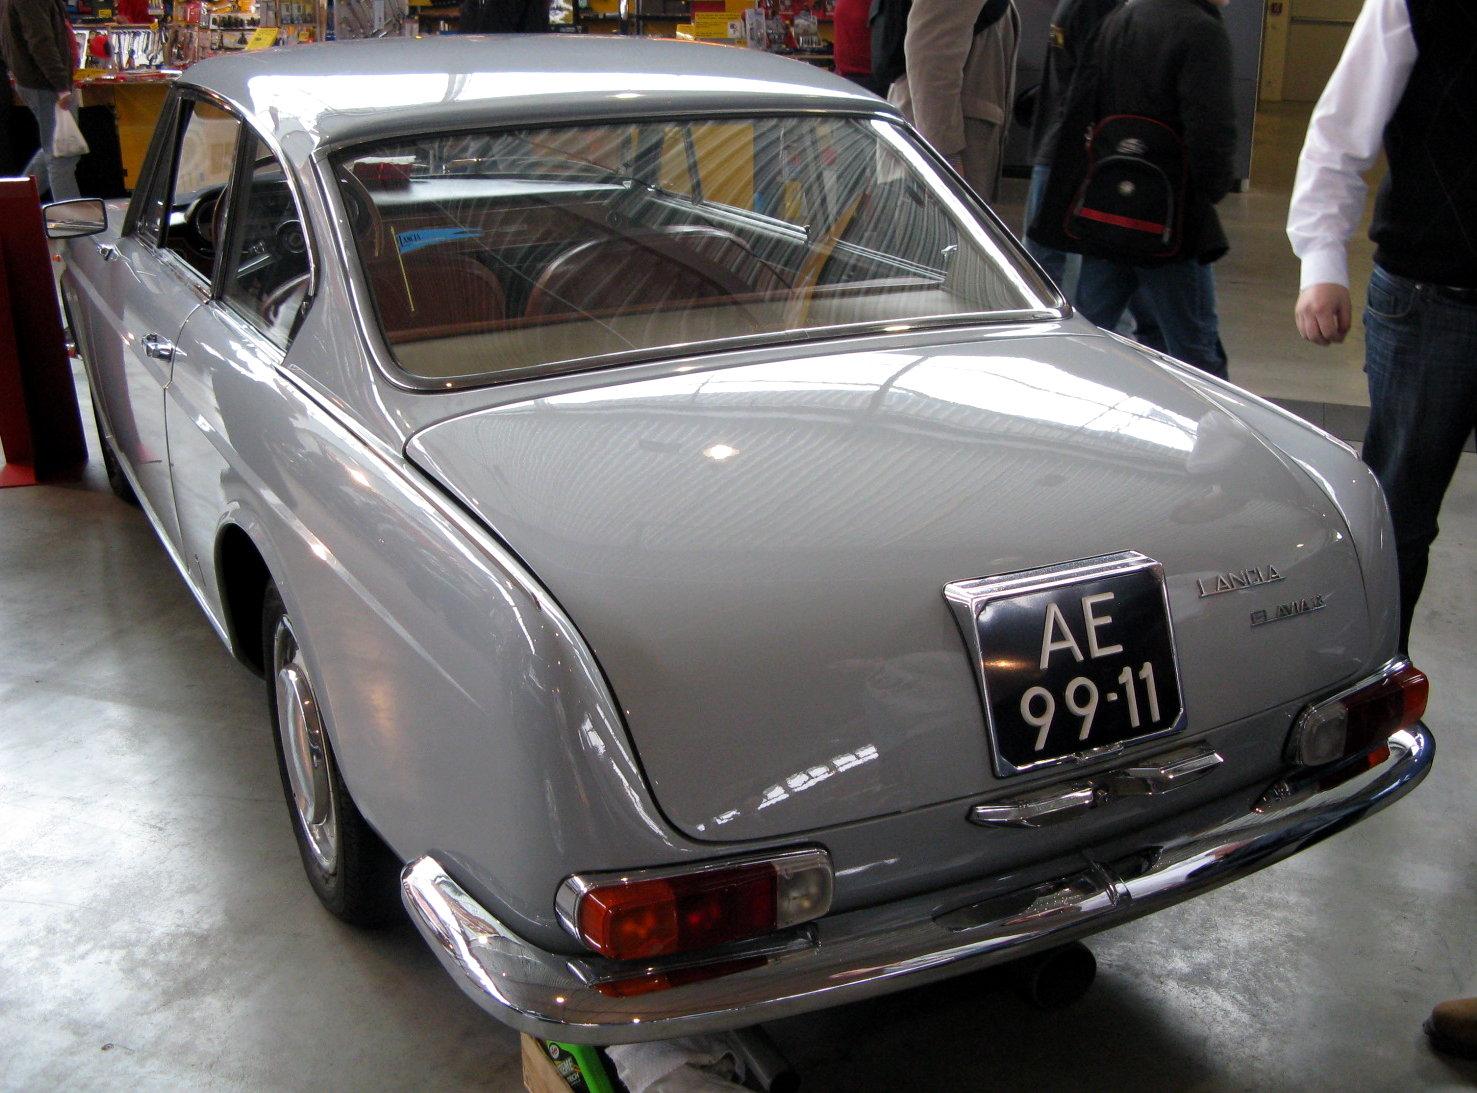 file:mhv lancia flavia coupe 1800 1965 02 - wikimedia commons